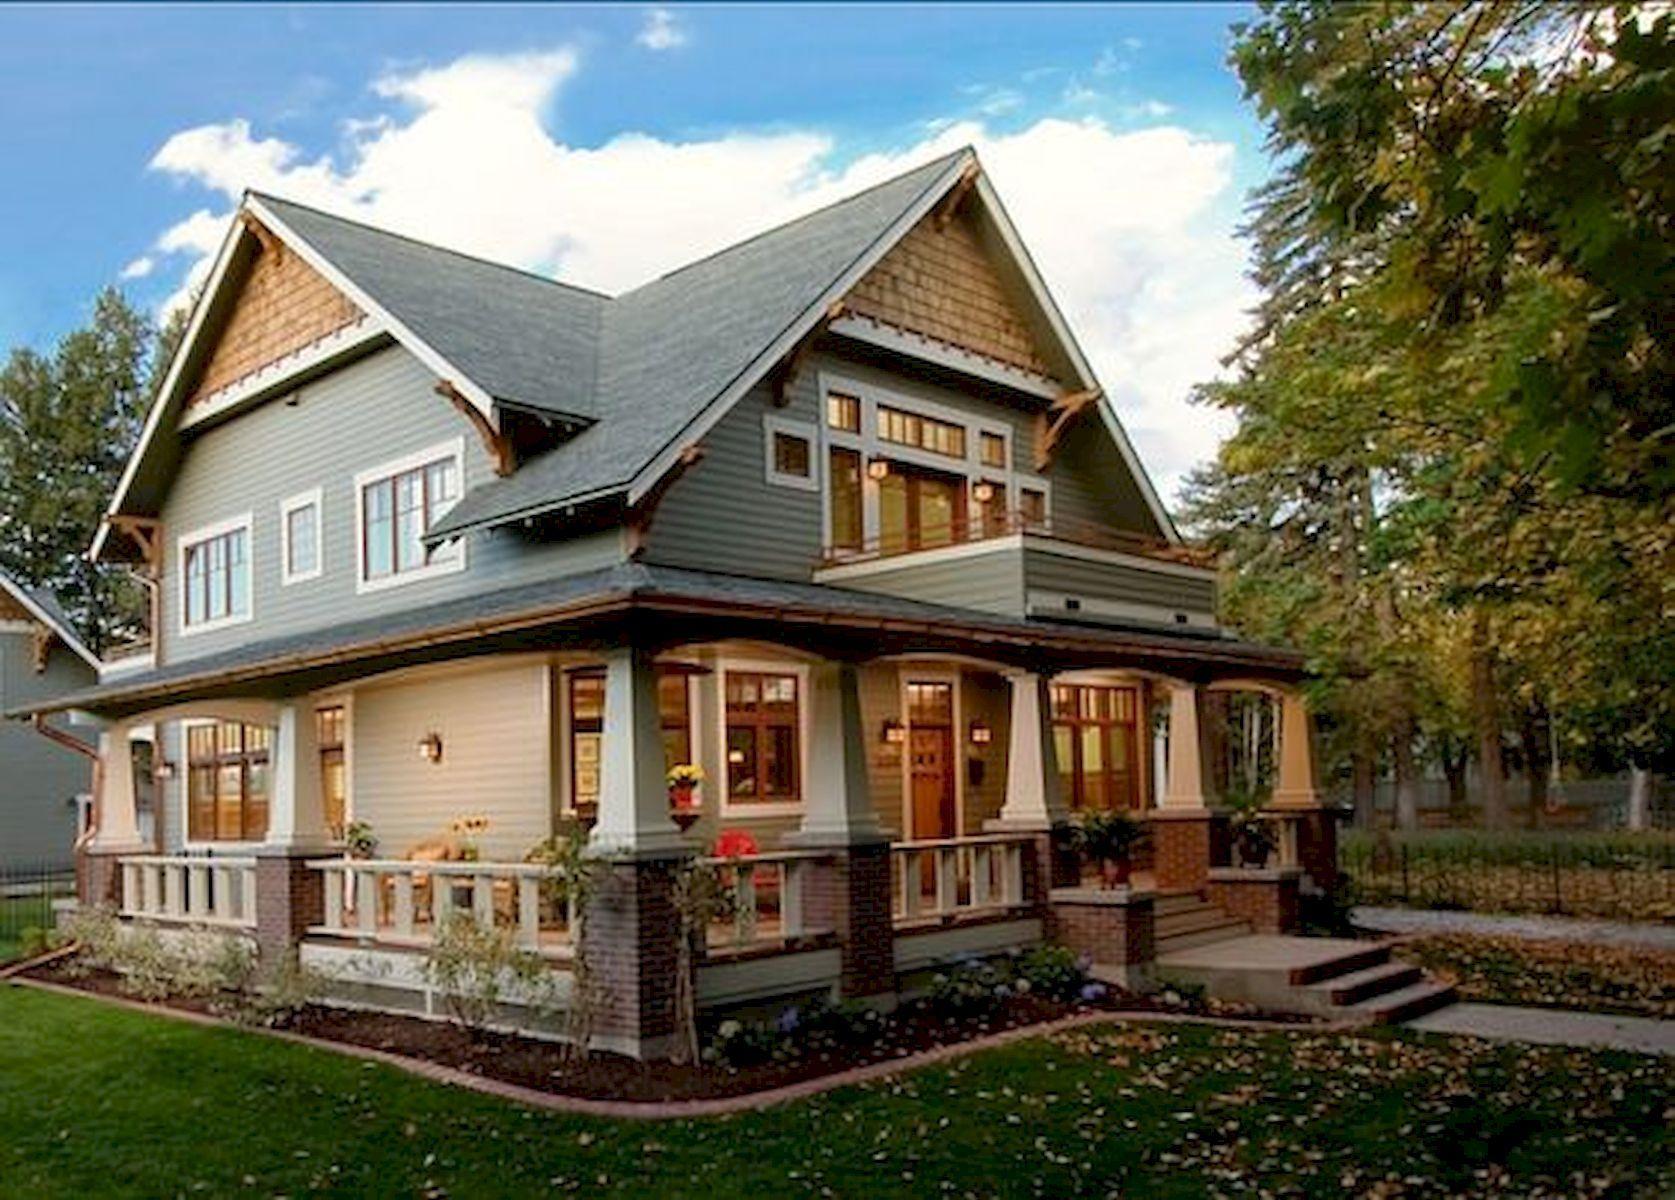 40 Amazing Craftsman Style Homes Design Ideas #craftsmanstylehomes